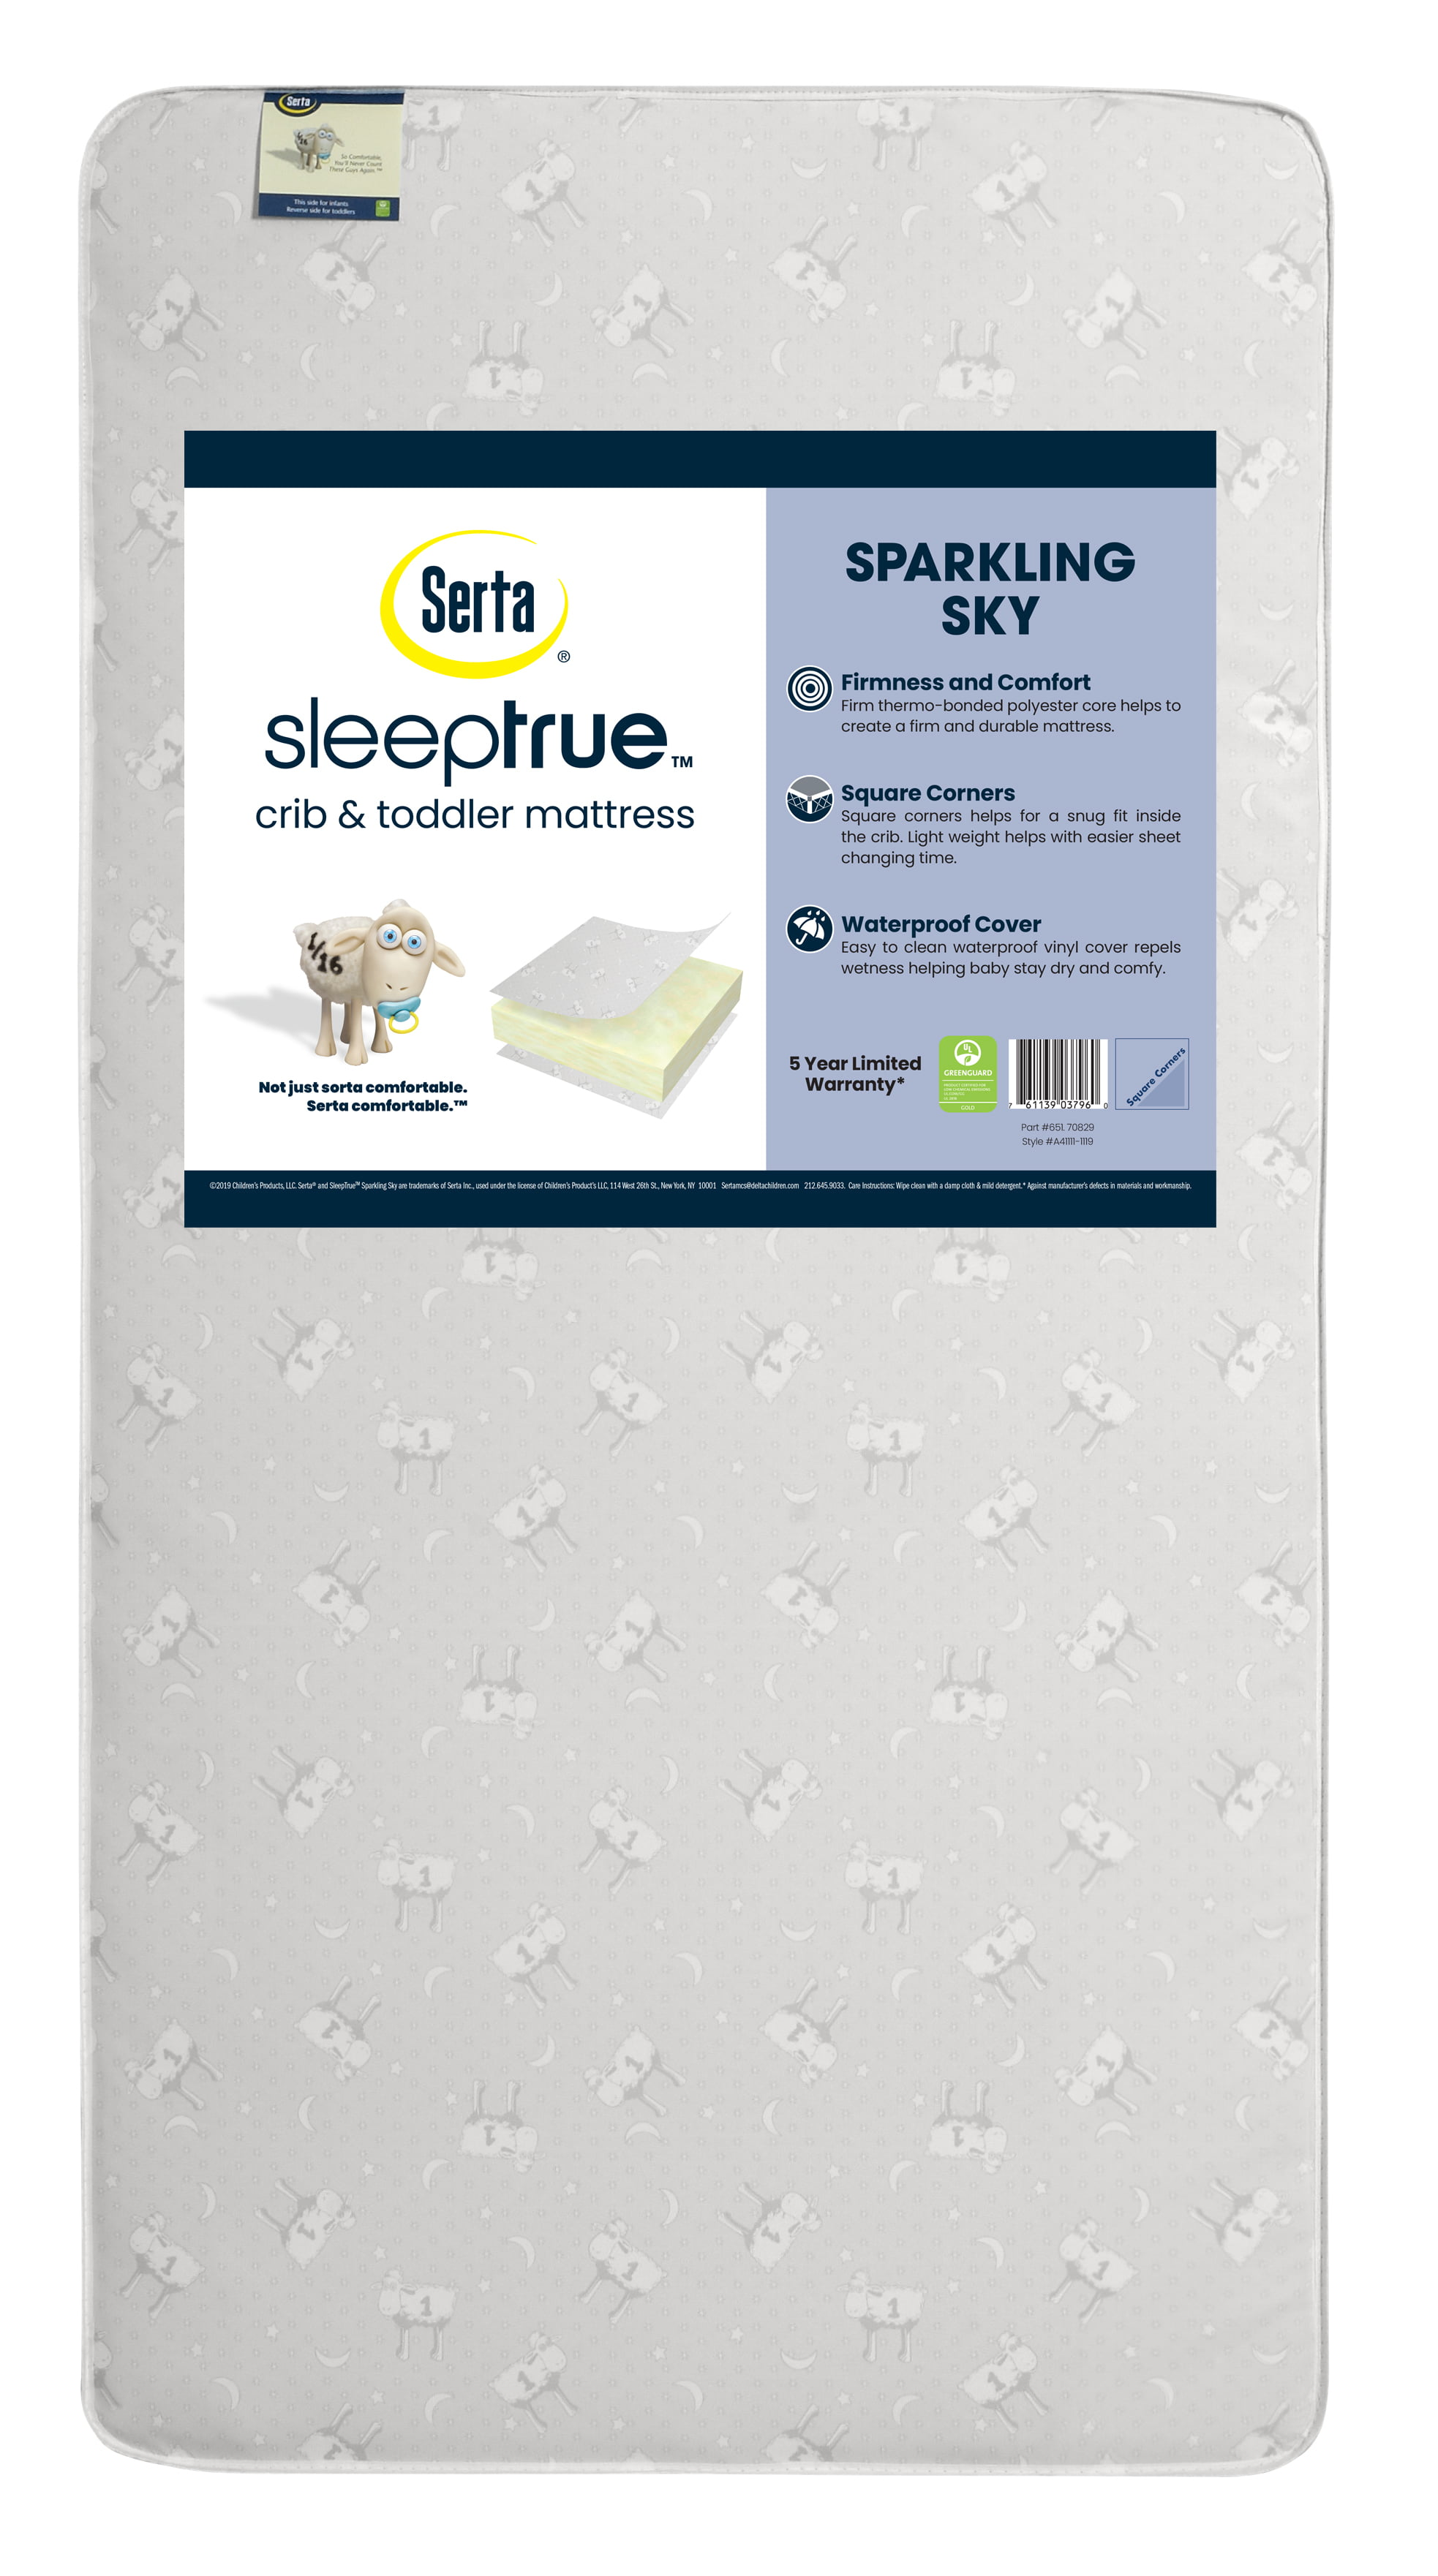 Serta Perfect Start Fiber Core Crib and Toddler MattressWaterproof